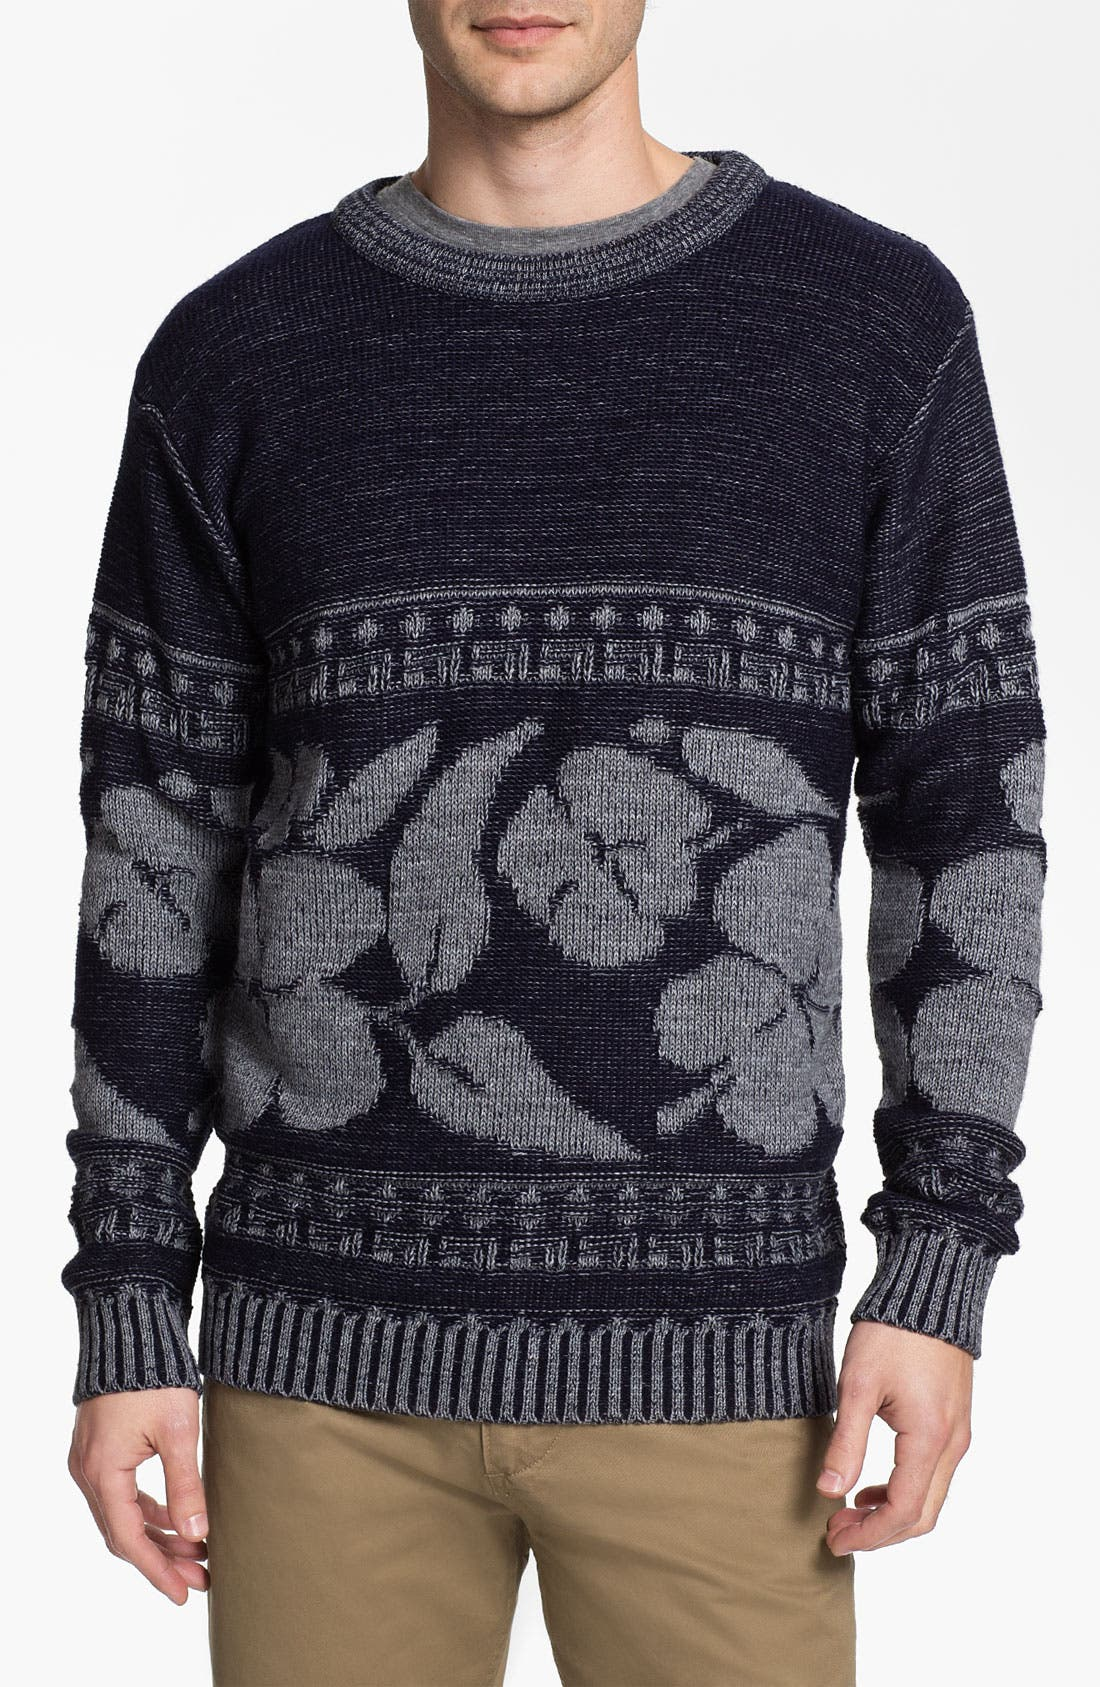 Alternate Image 1 Selected - Vanguard 'Hibiscus' Crewneck Sweater